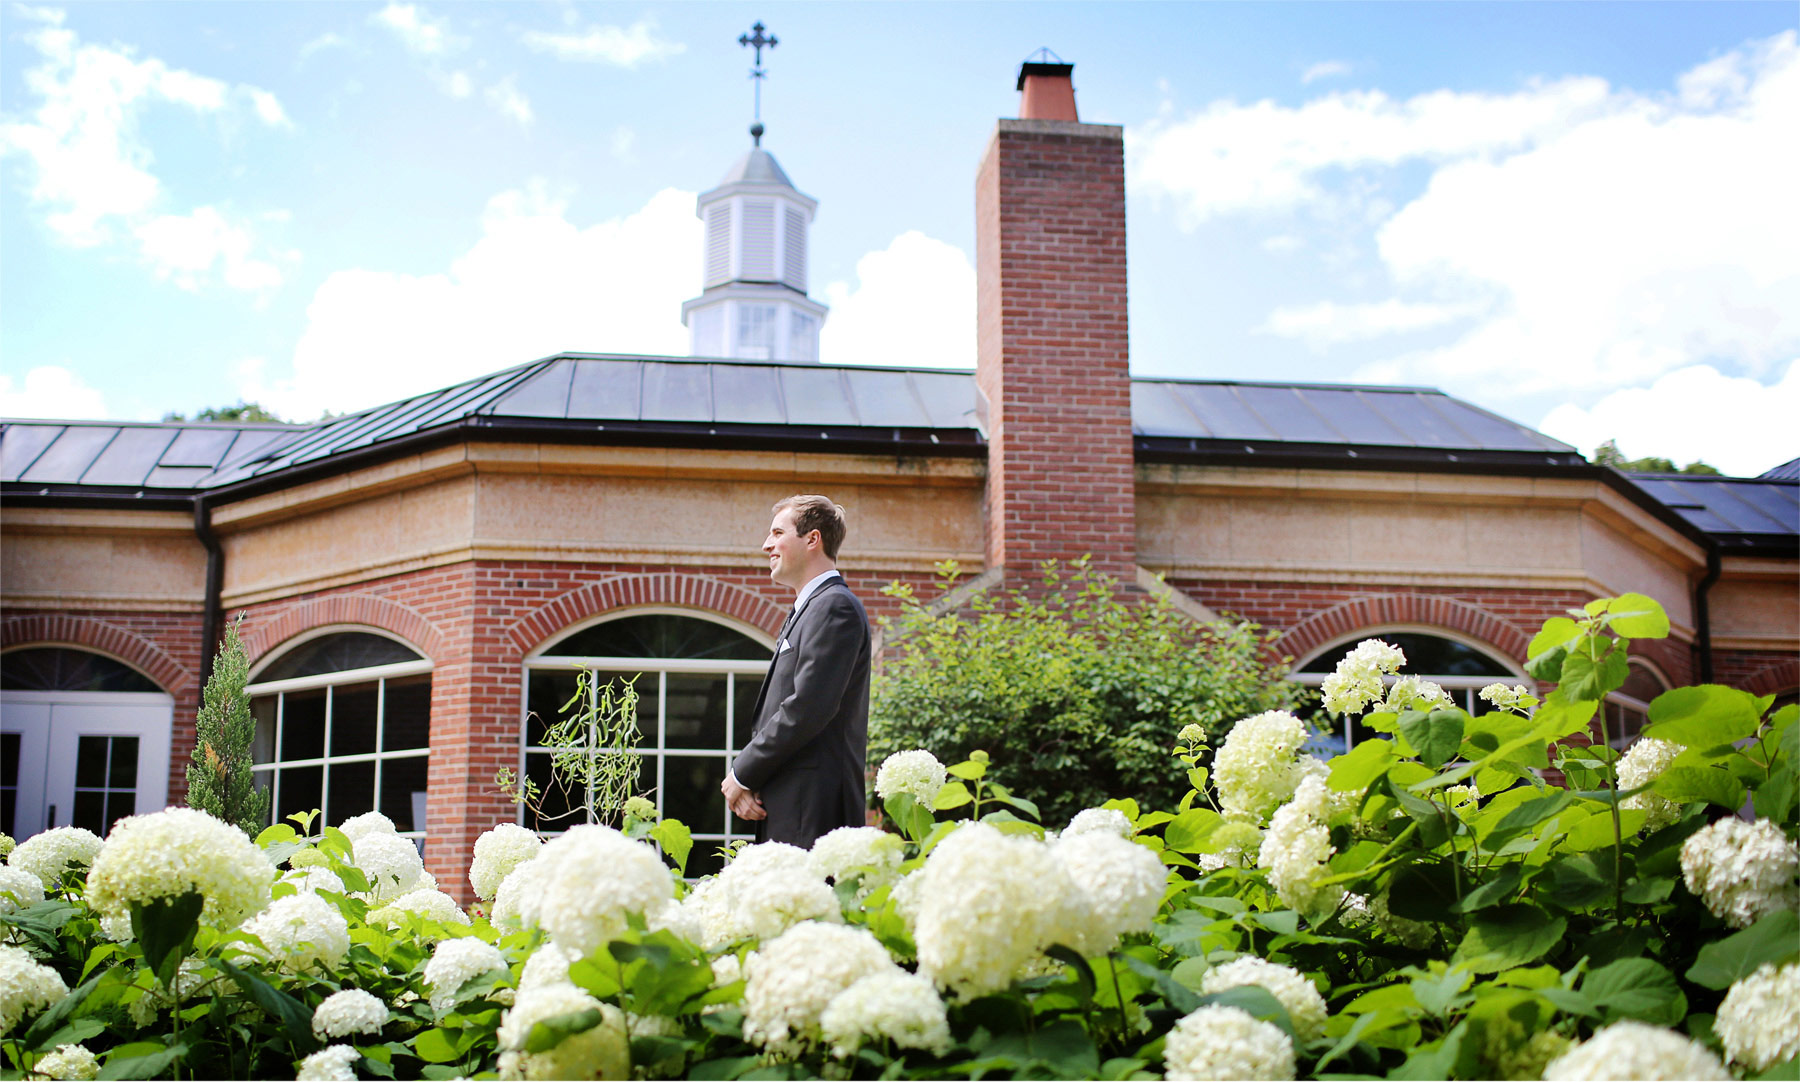 01-Edina-Minnesota-Wedding-Photographer-by-Andrew-Vick-Photography-Summer-Our-Lady-of-Grace-Catholic-Parish-Church-Groom-First-Look-Meeting-Betsy-and-Jon.jpg